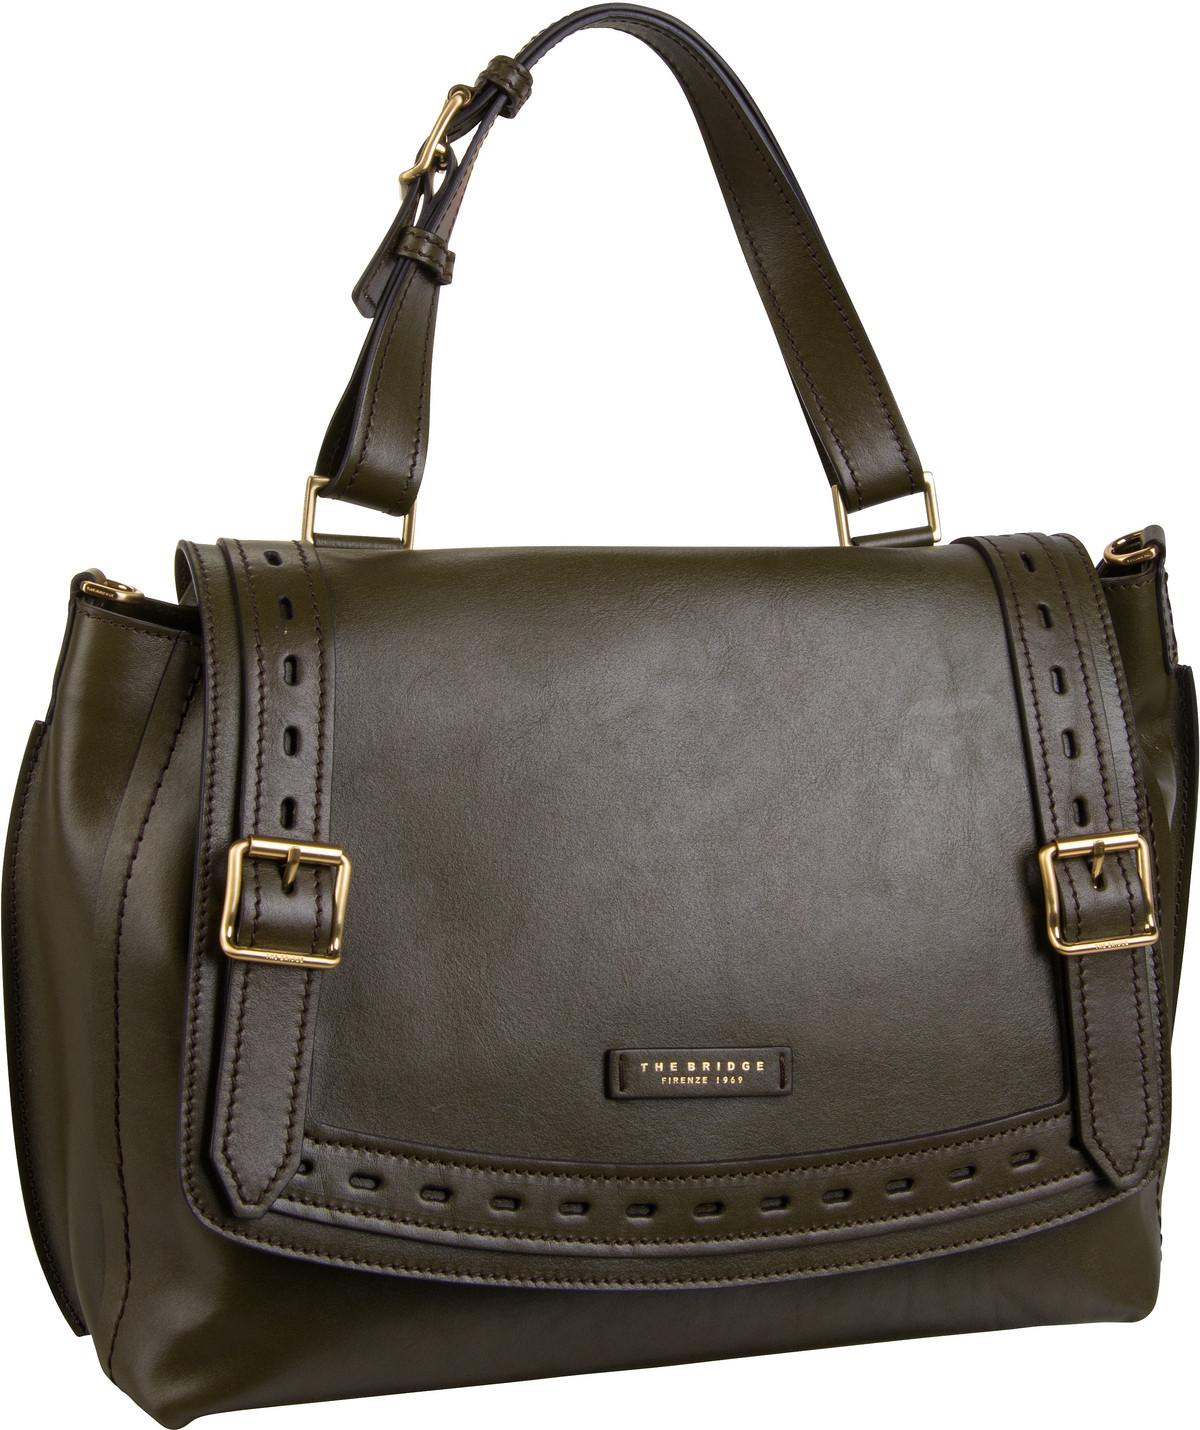 Handtasche Calimala Handtasche 4529 Green Bosco